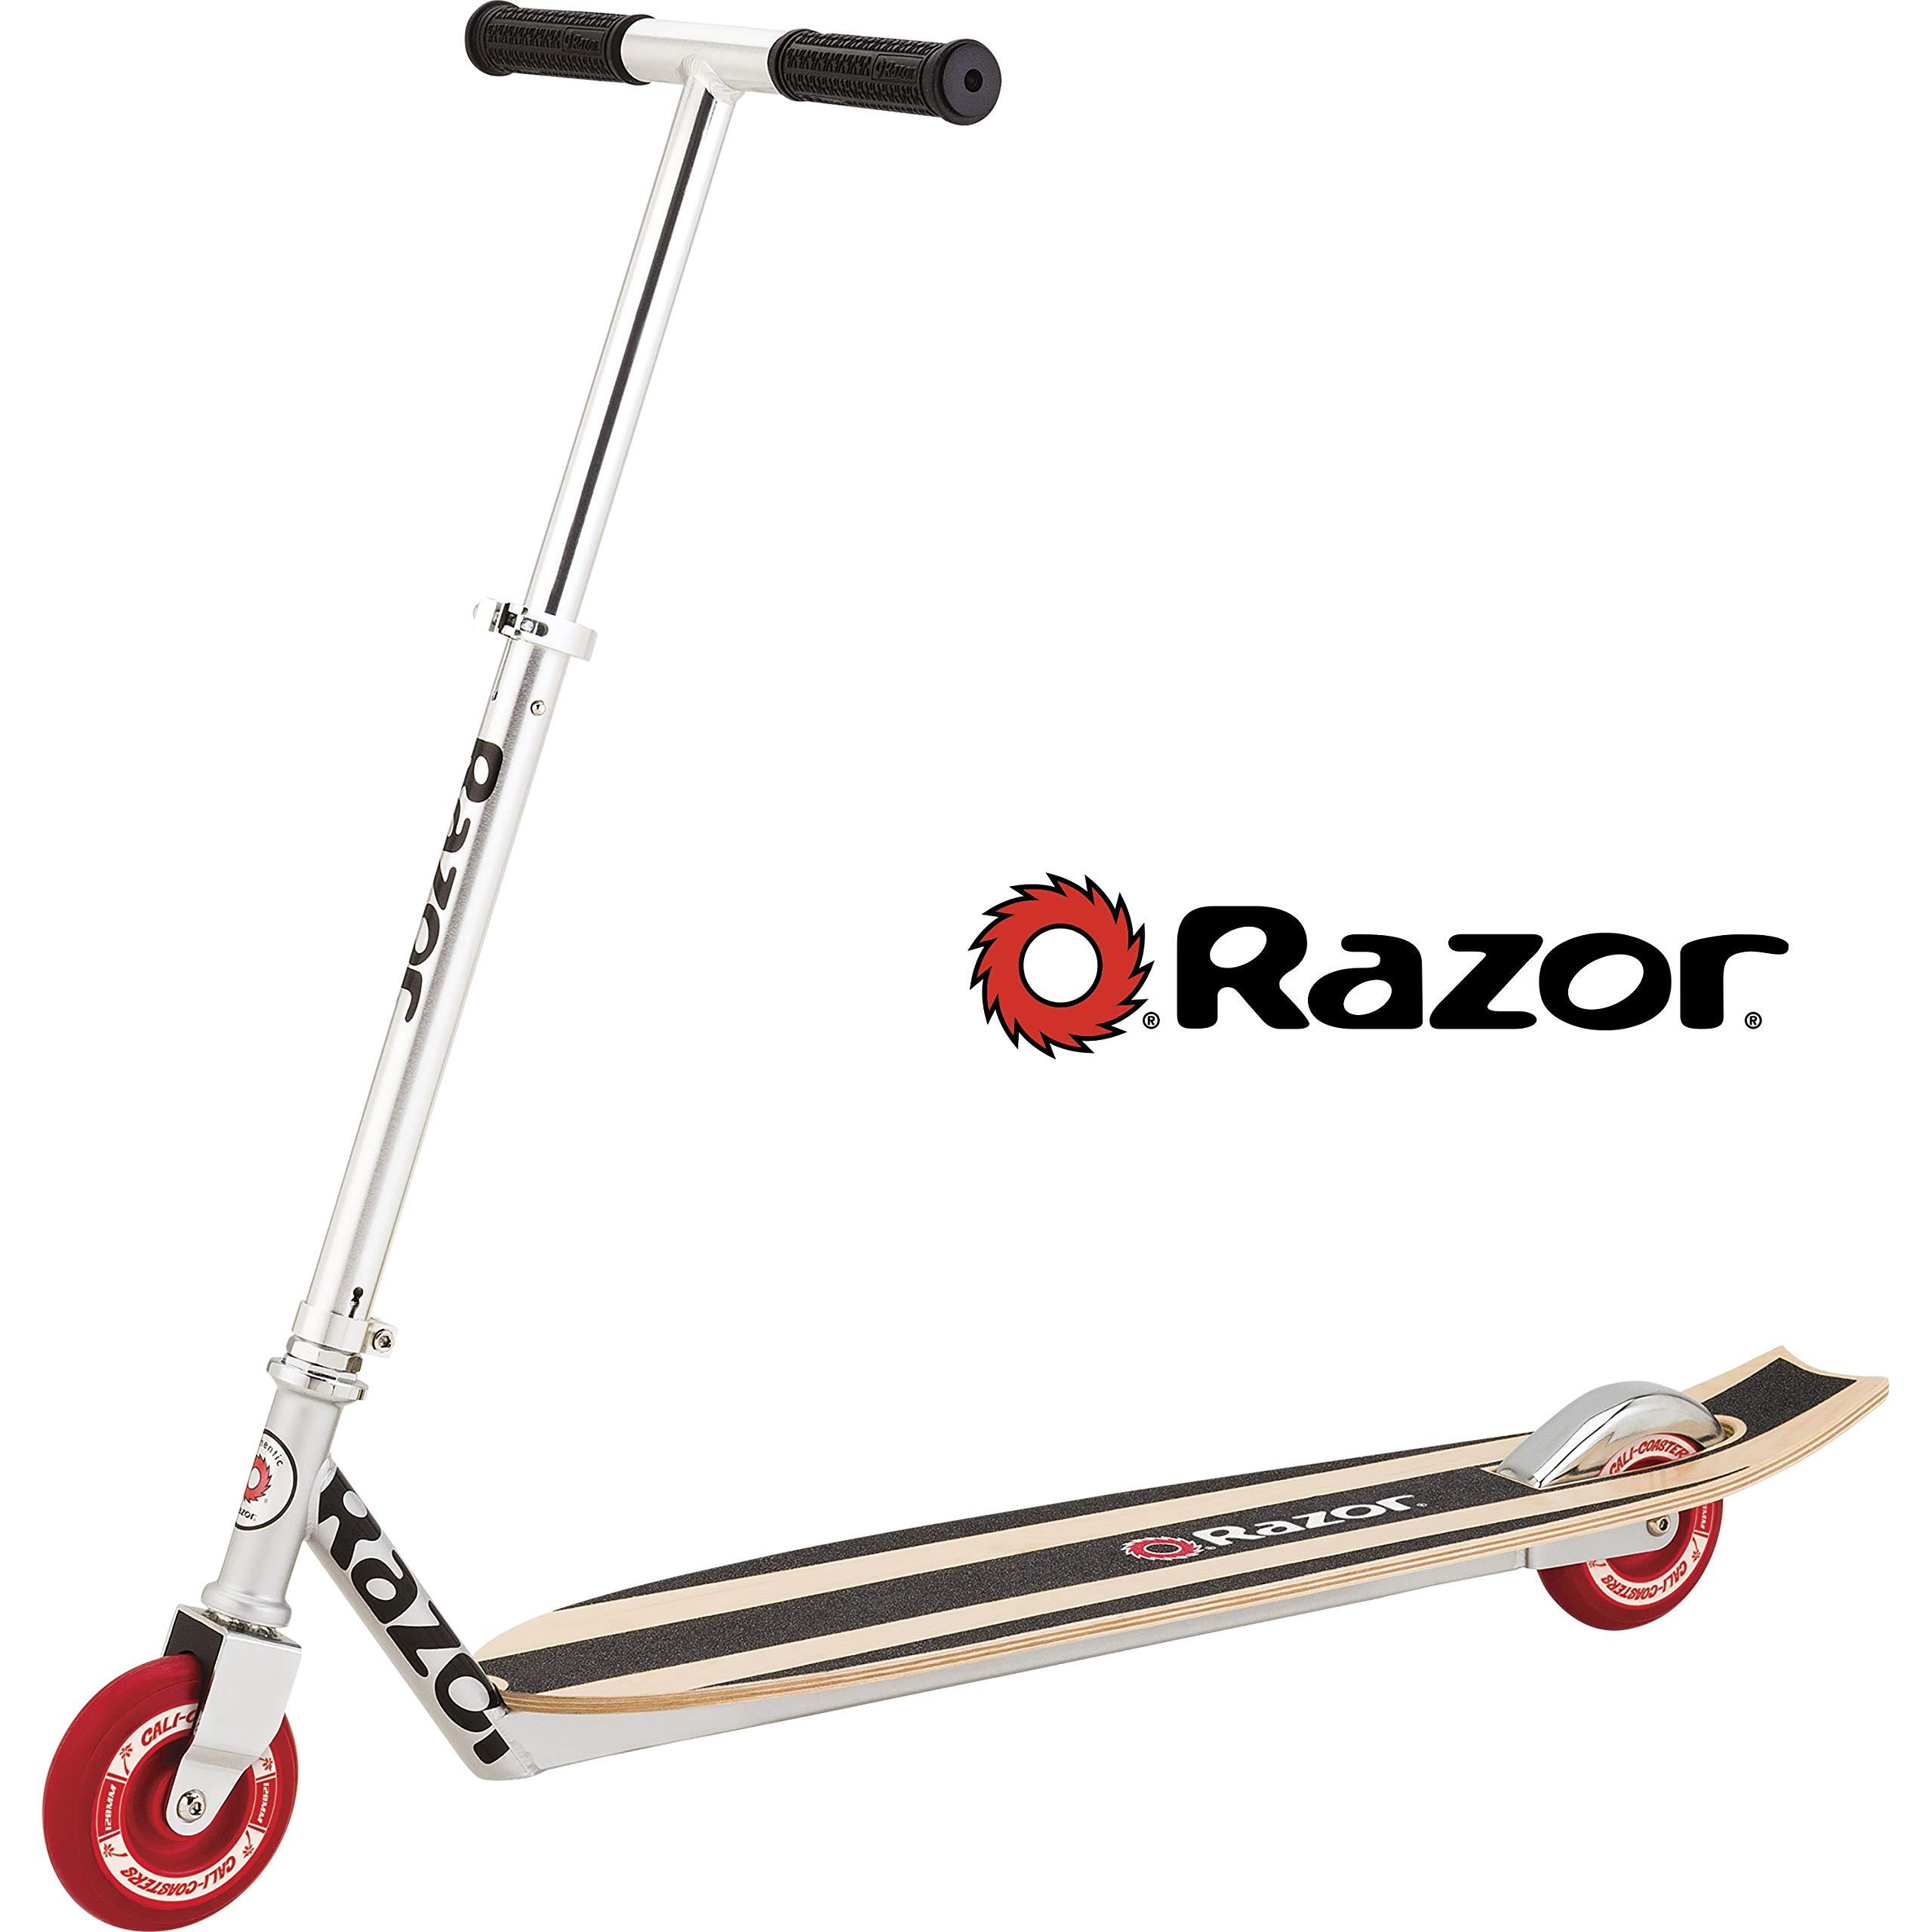 Razor California Longboard Kick Scooter - Wood Deck by Razor